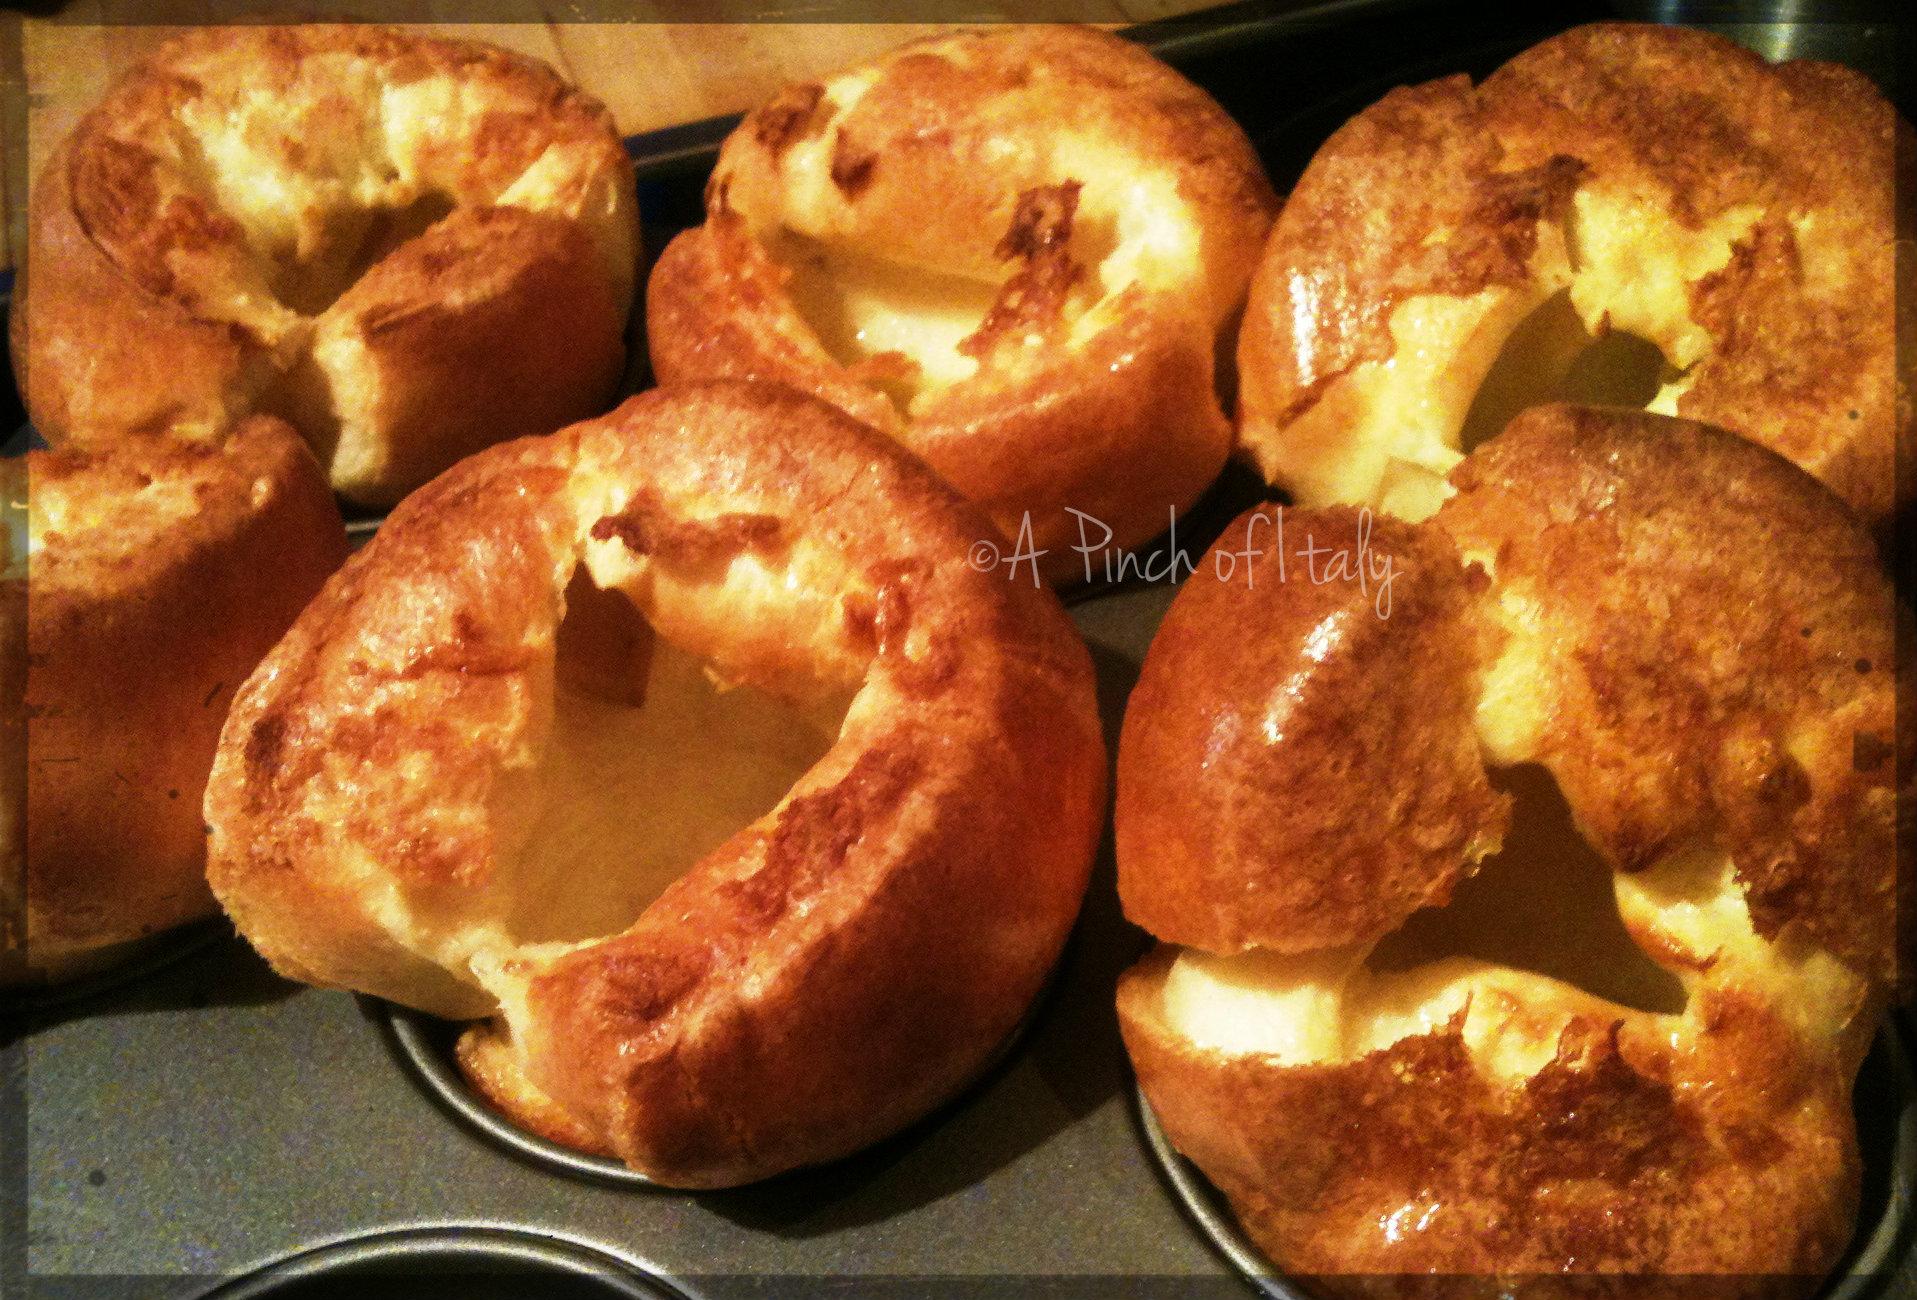 Yorkshire Pudding Ricetta Bimby.Yorkshire Pudding